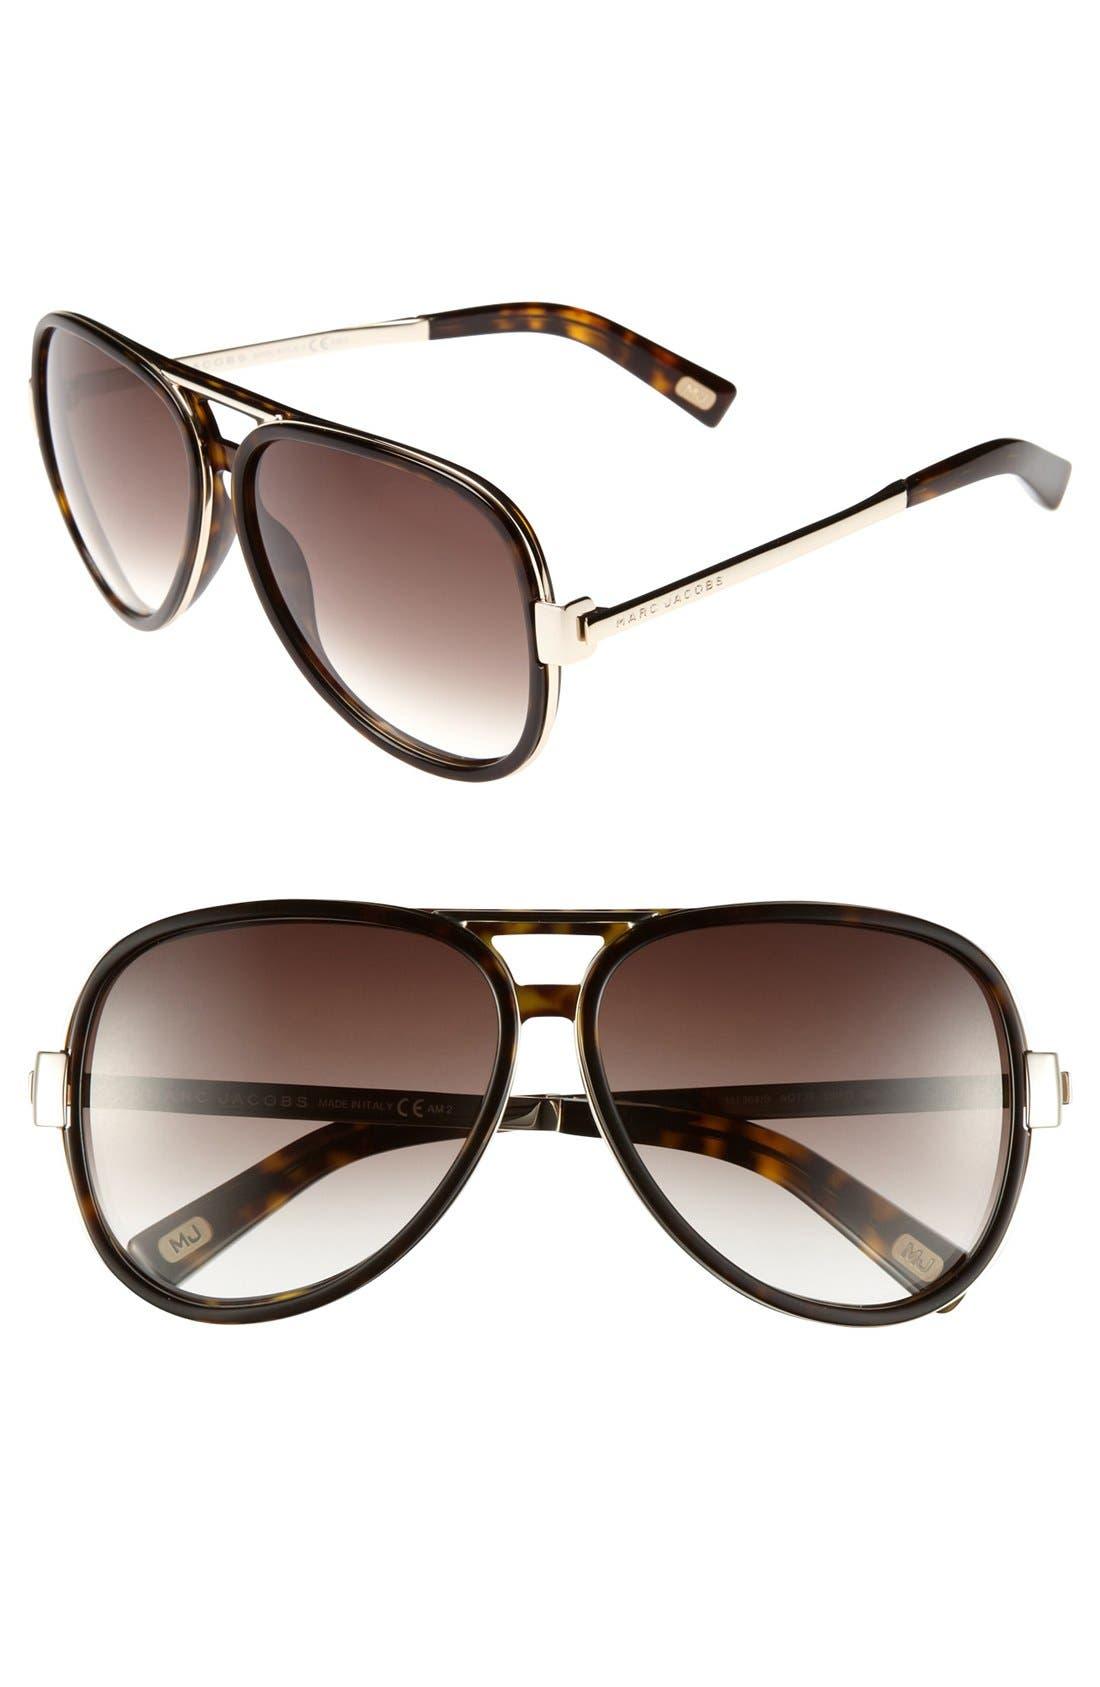 Main Image - MARC JACOBS 59mm Aviator Sunglasses